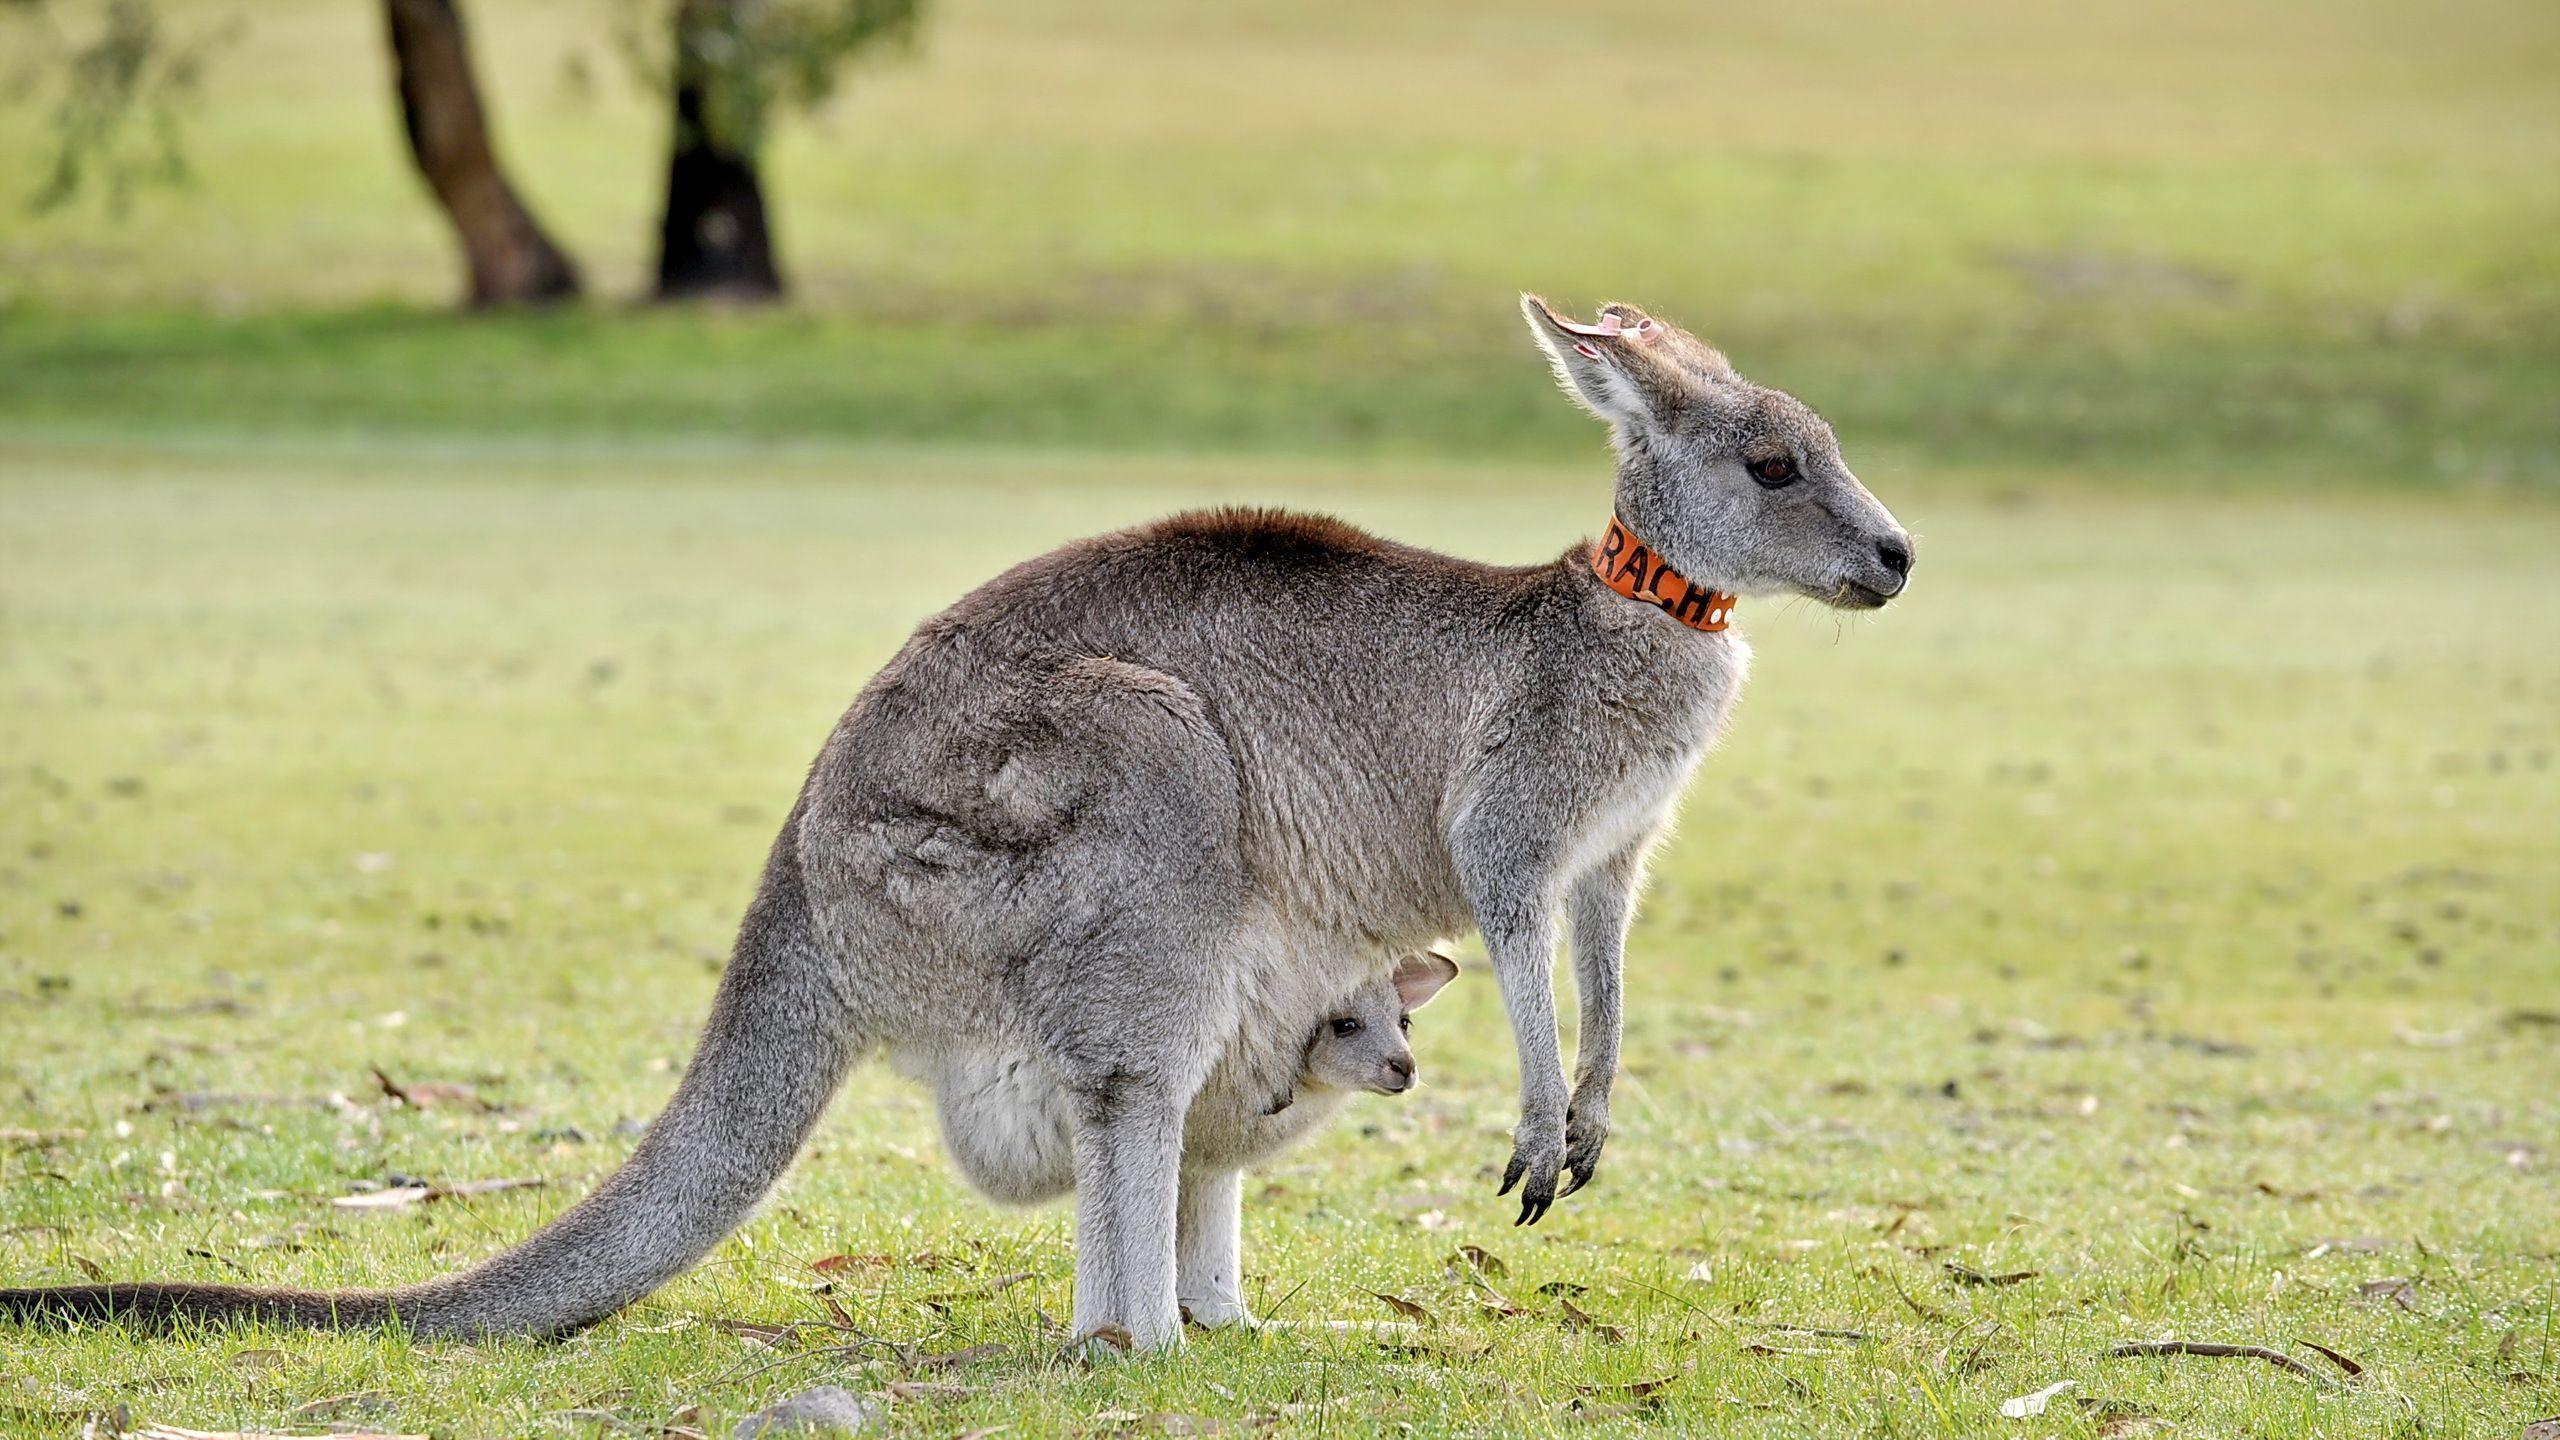 Kangaroo Computer Wallpapers, Desktop Backgrounds 2560x1440 Id: 373736